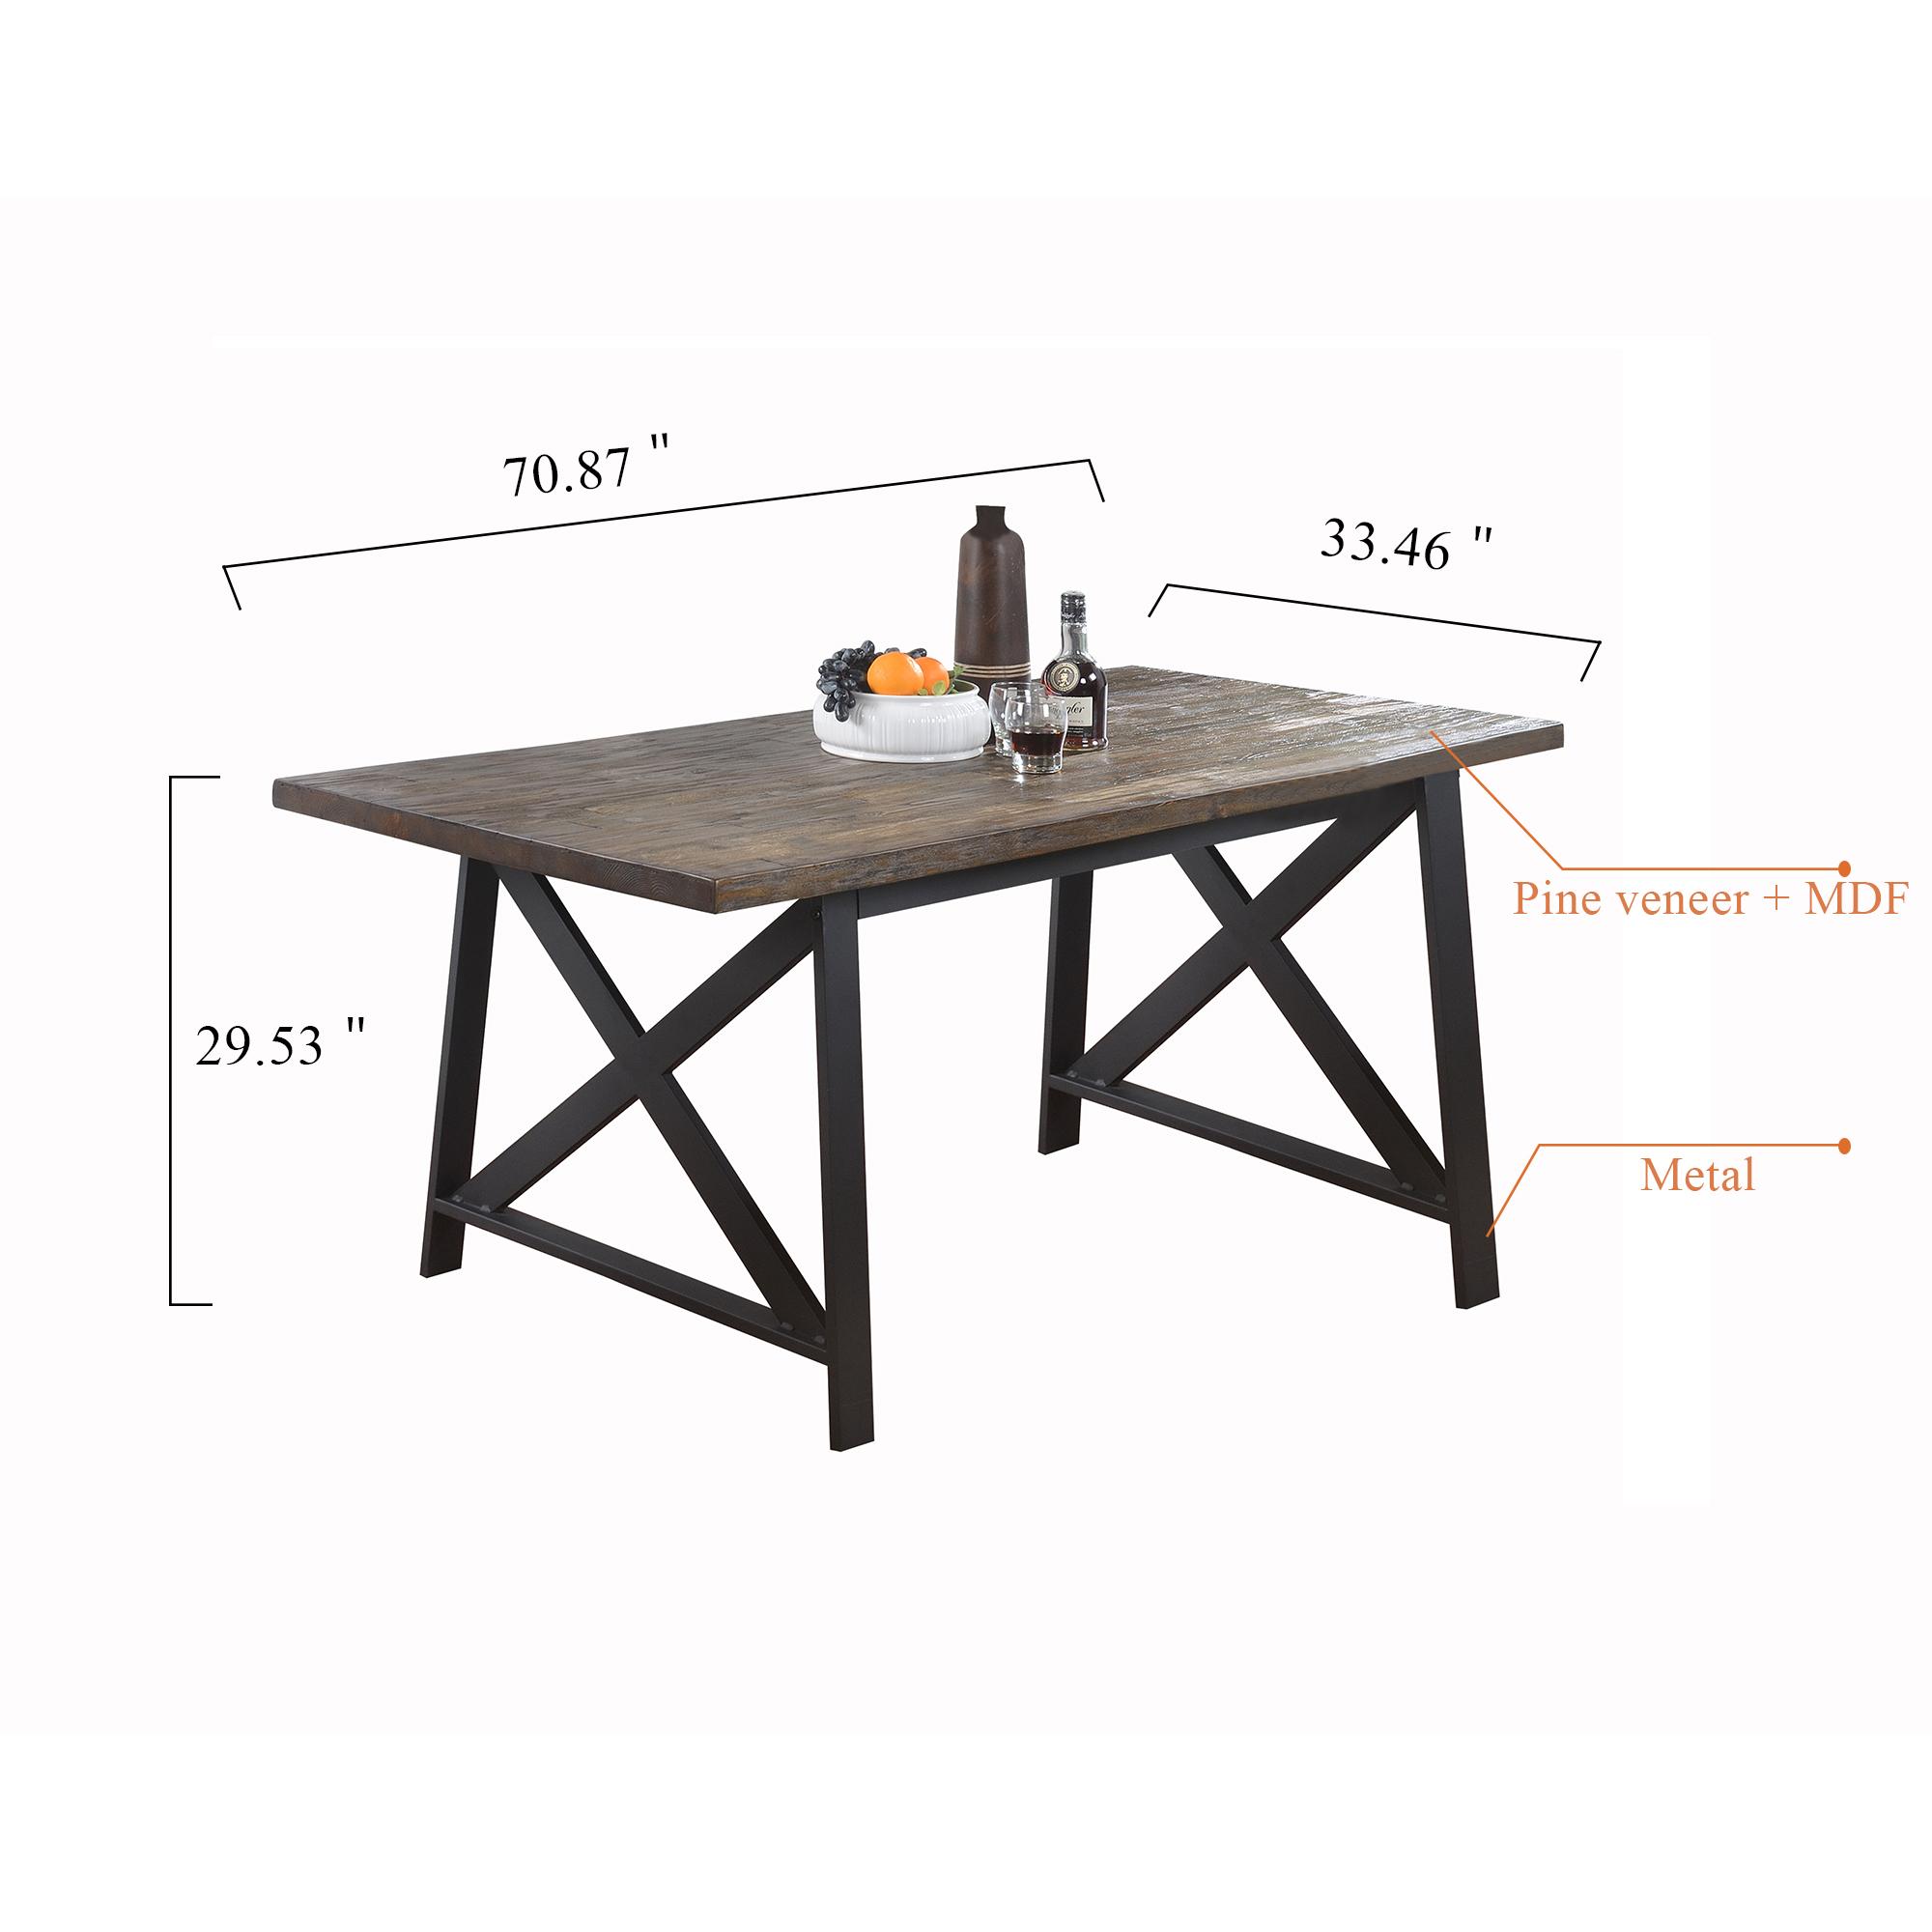 1683D Rustic table set 桌子 副本 2